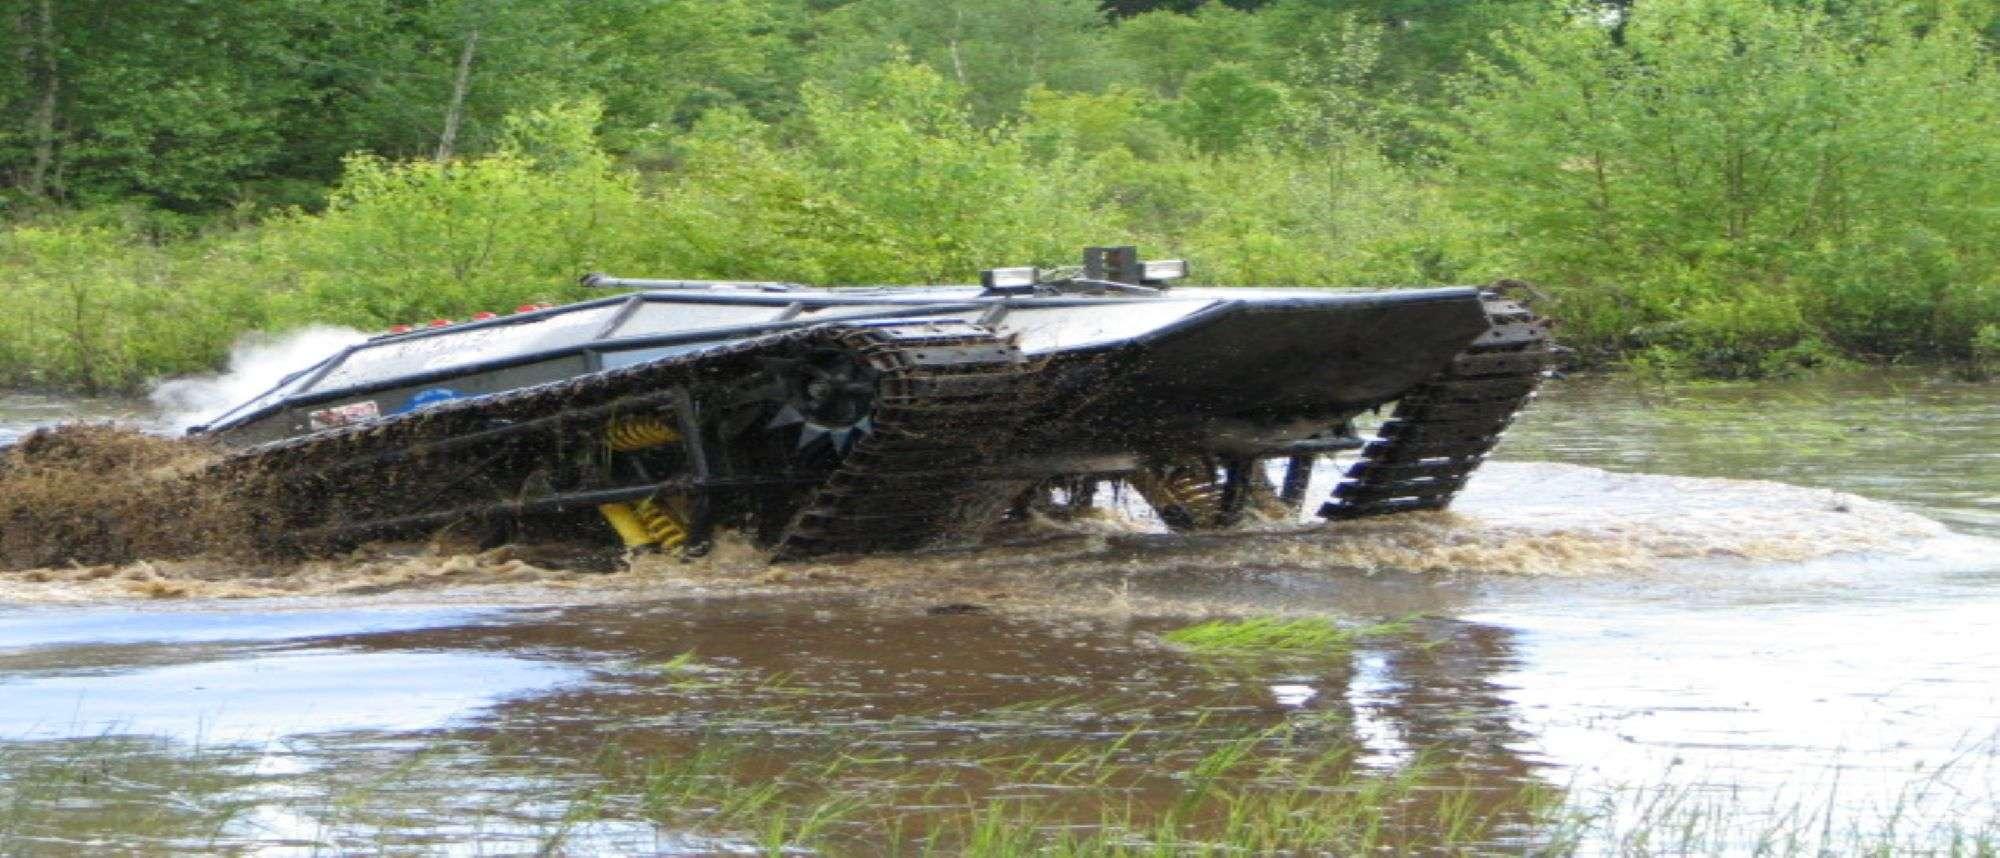 M5 in crossing water